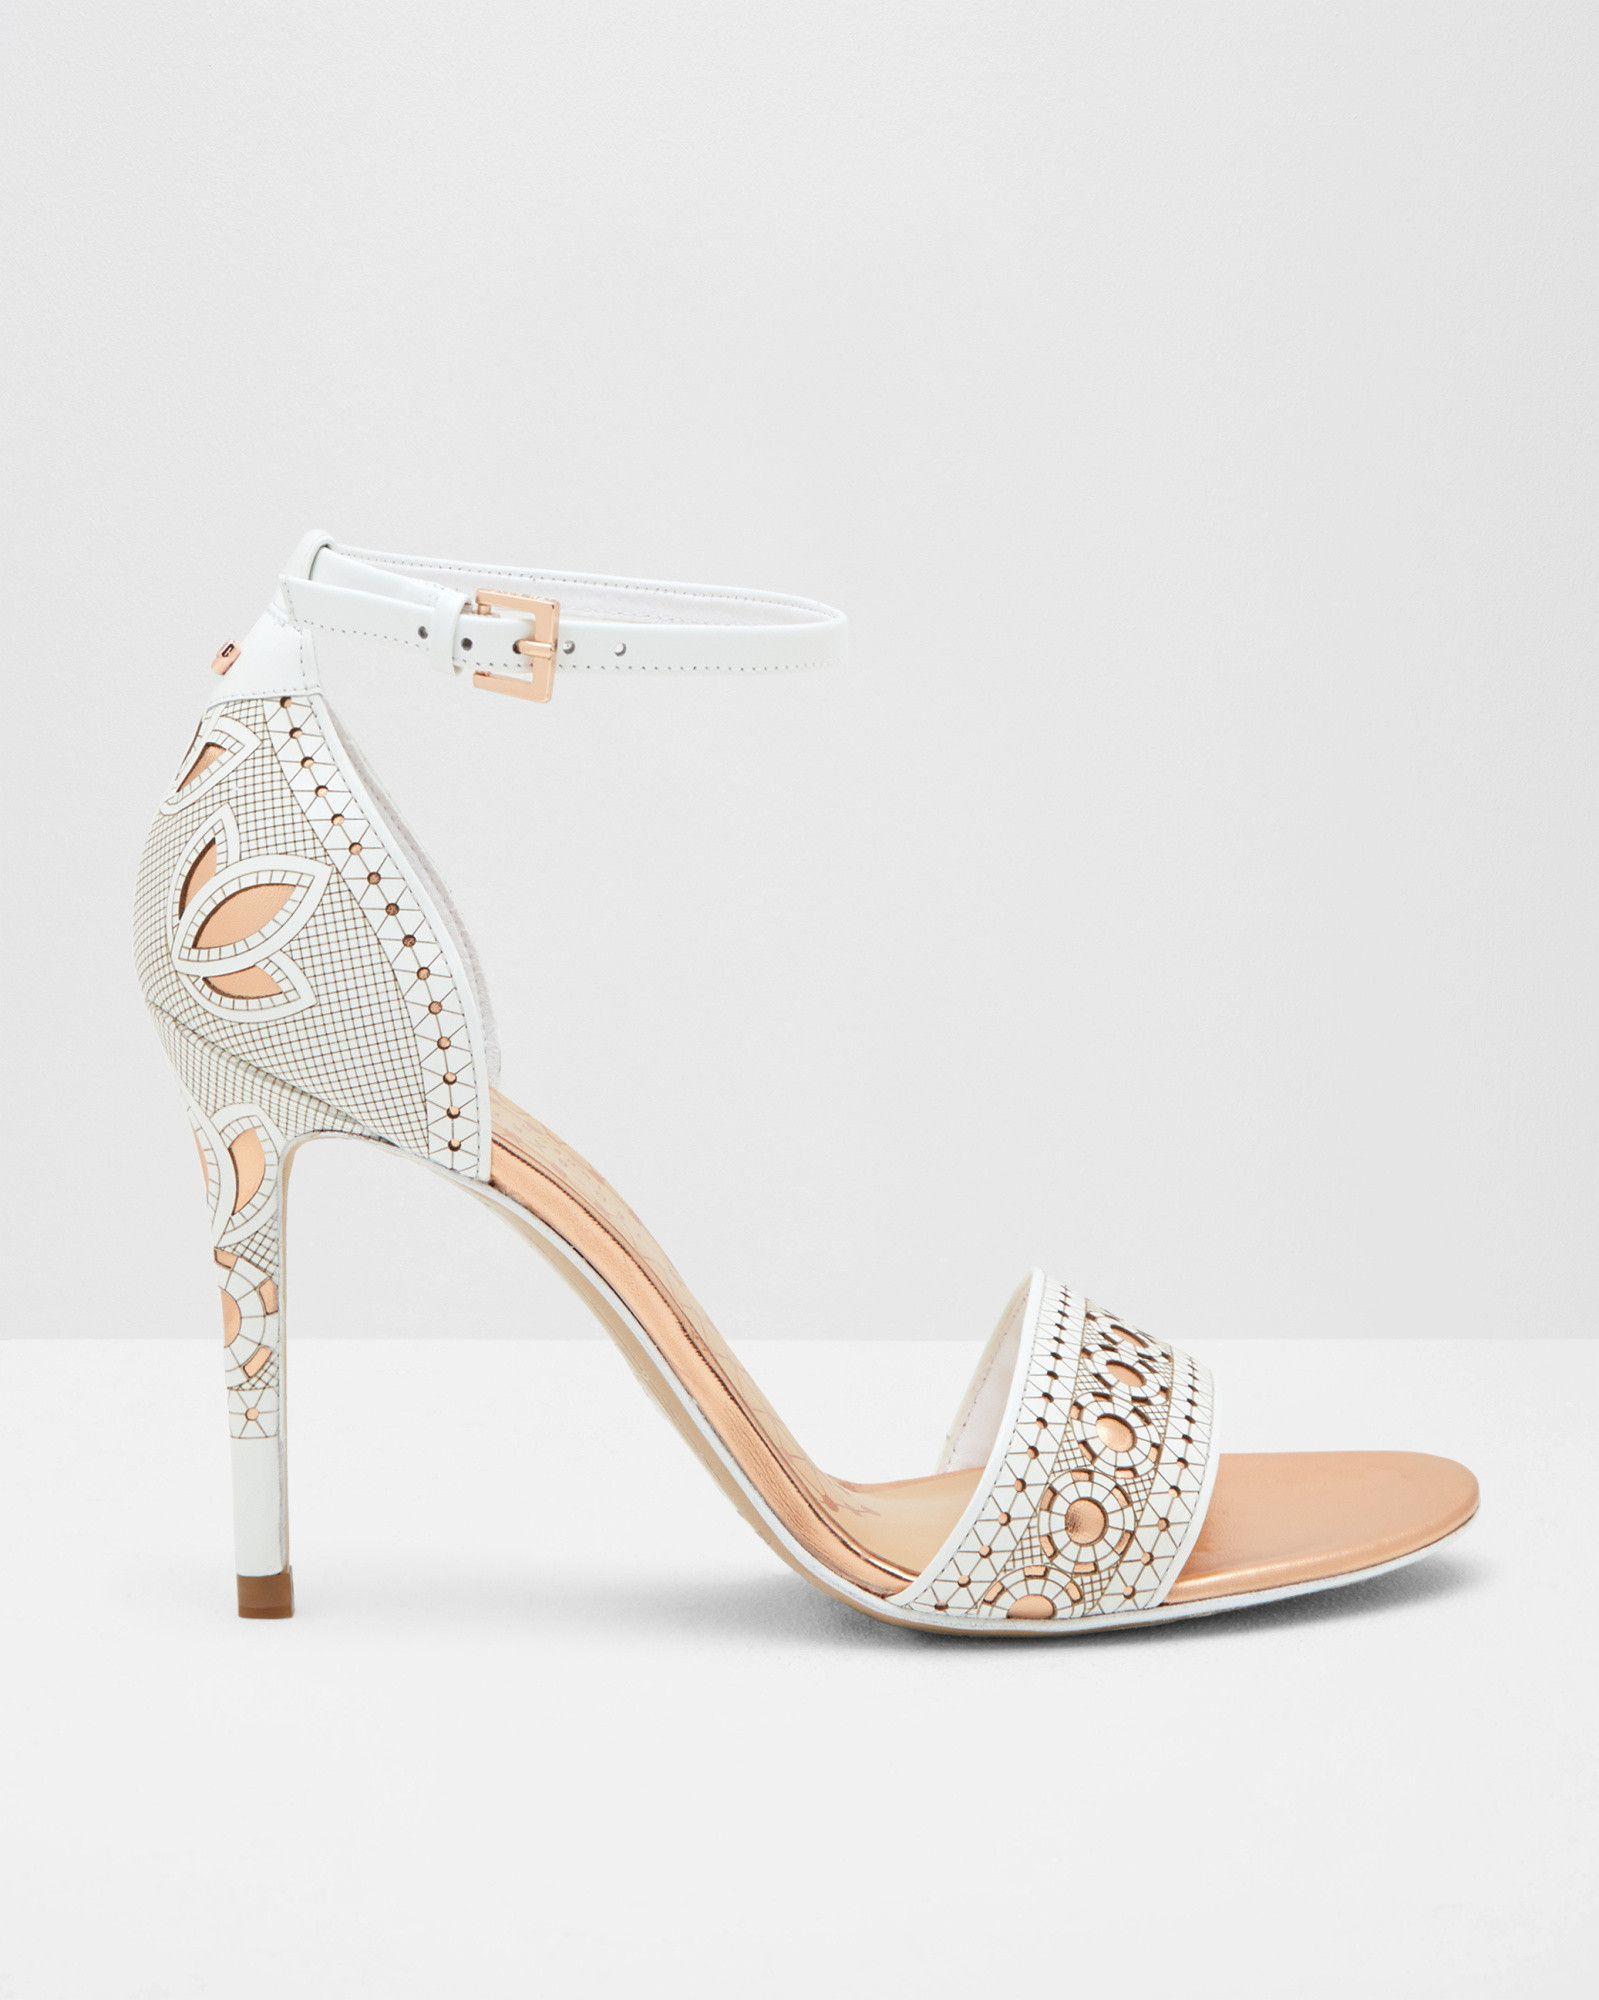 Hohe Riemensandalen mit gelasertem Muster - Weiß | Schuhe | Ted Baker DE